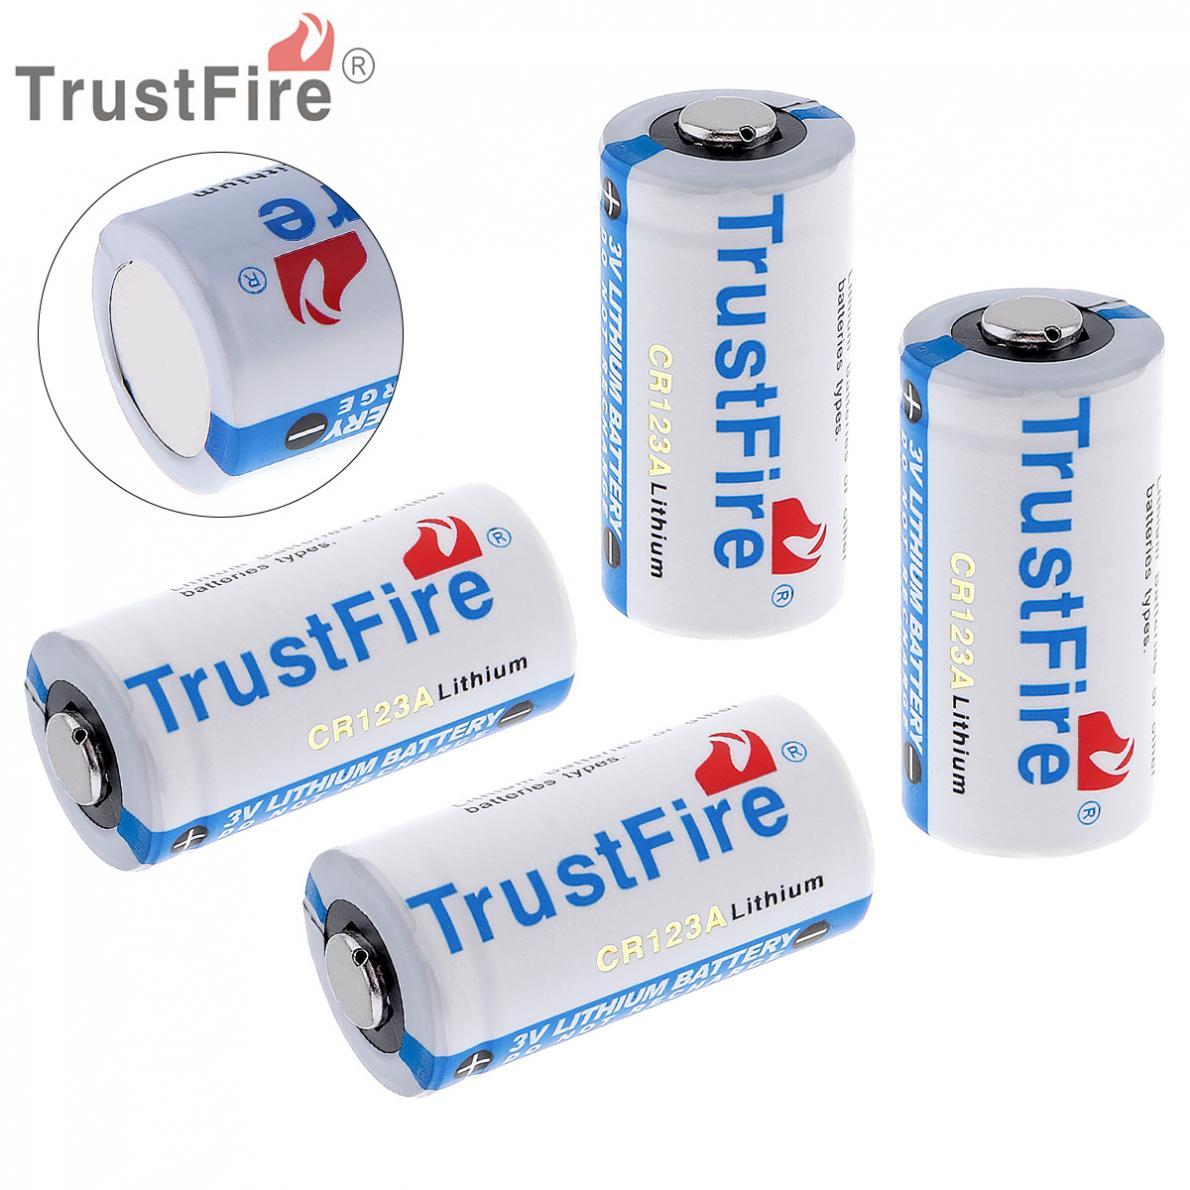 TrustFire 8 piezas 3 V 1400 mAh CR123A 16340 batería de iones de litio batería recargable con válvula de seguridad 3S 20A 18650 Li-ion cargador de batería de litio Placa de protección 10,8 V 11,1 V 12V 12,6 V eléctrico 10A Lipo BMS PCB módulo PCM